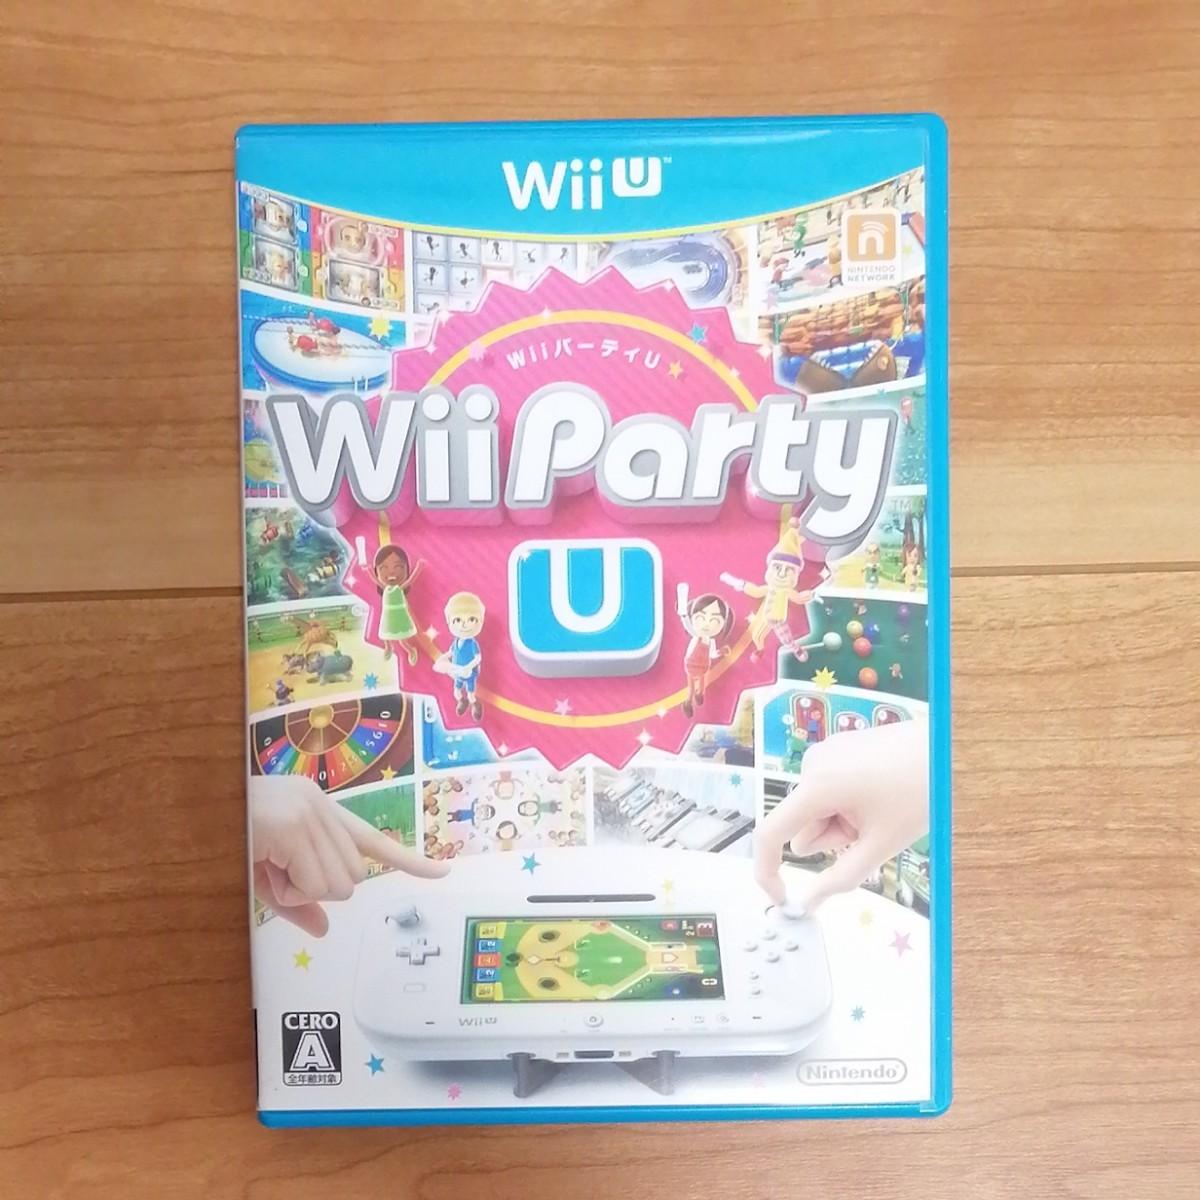 WiiU ソフト Wii Party U